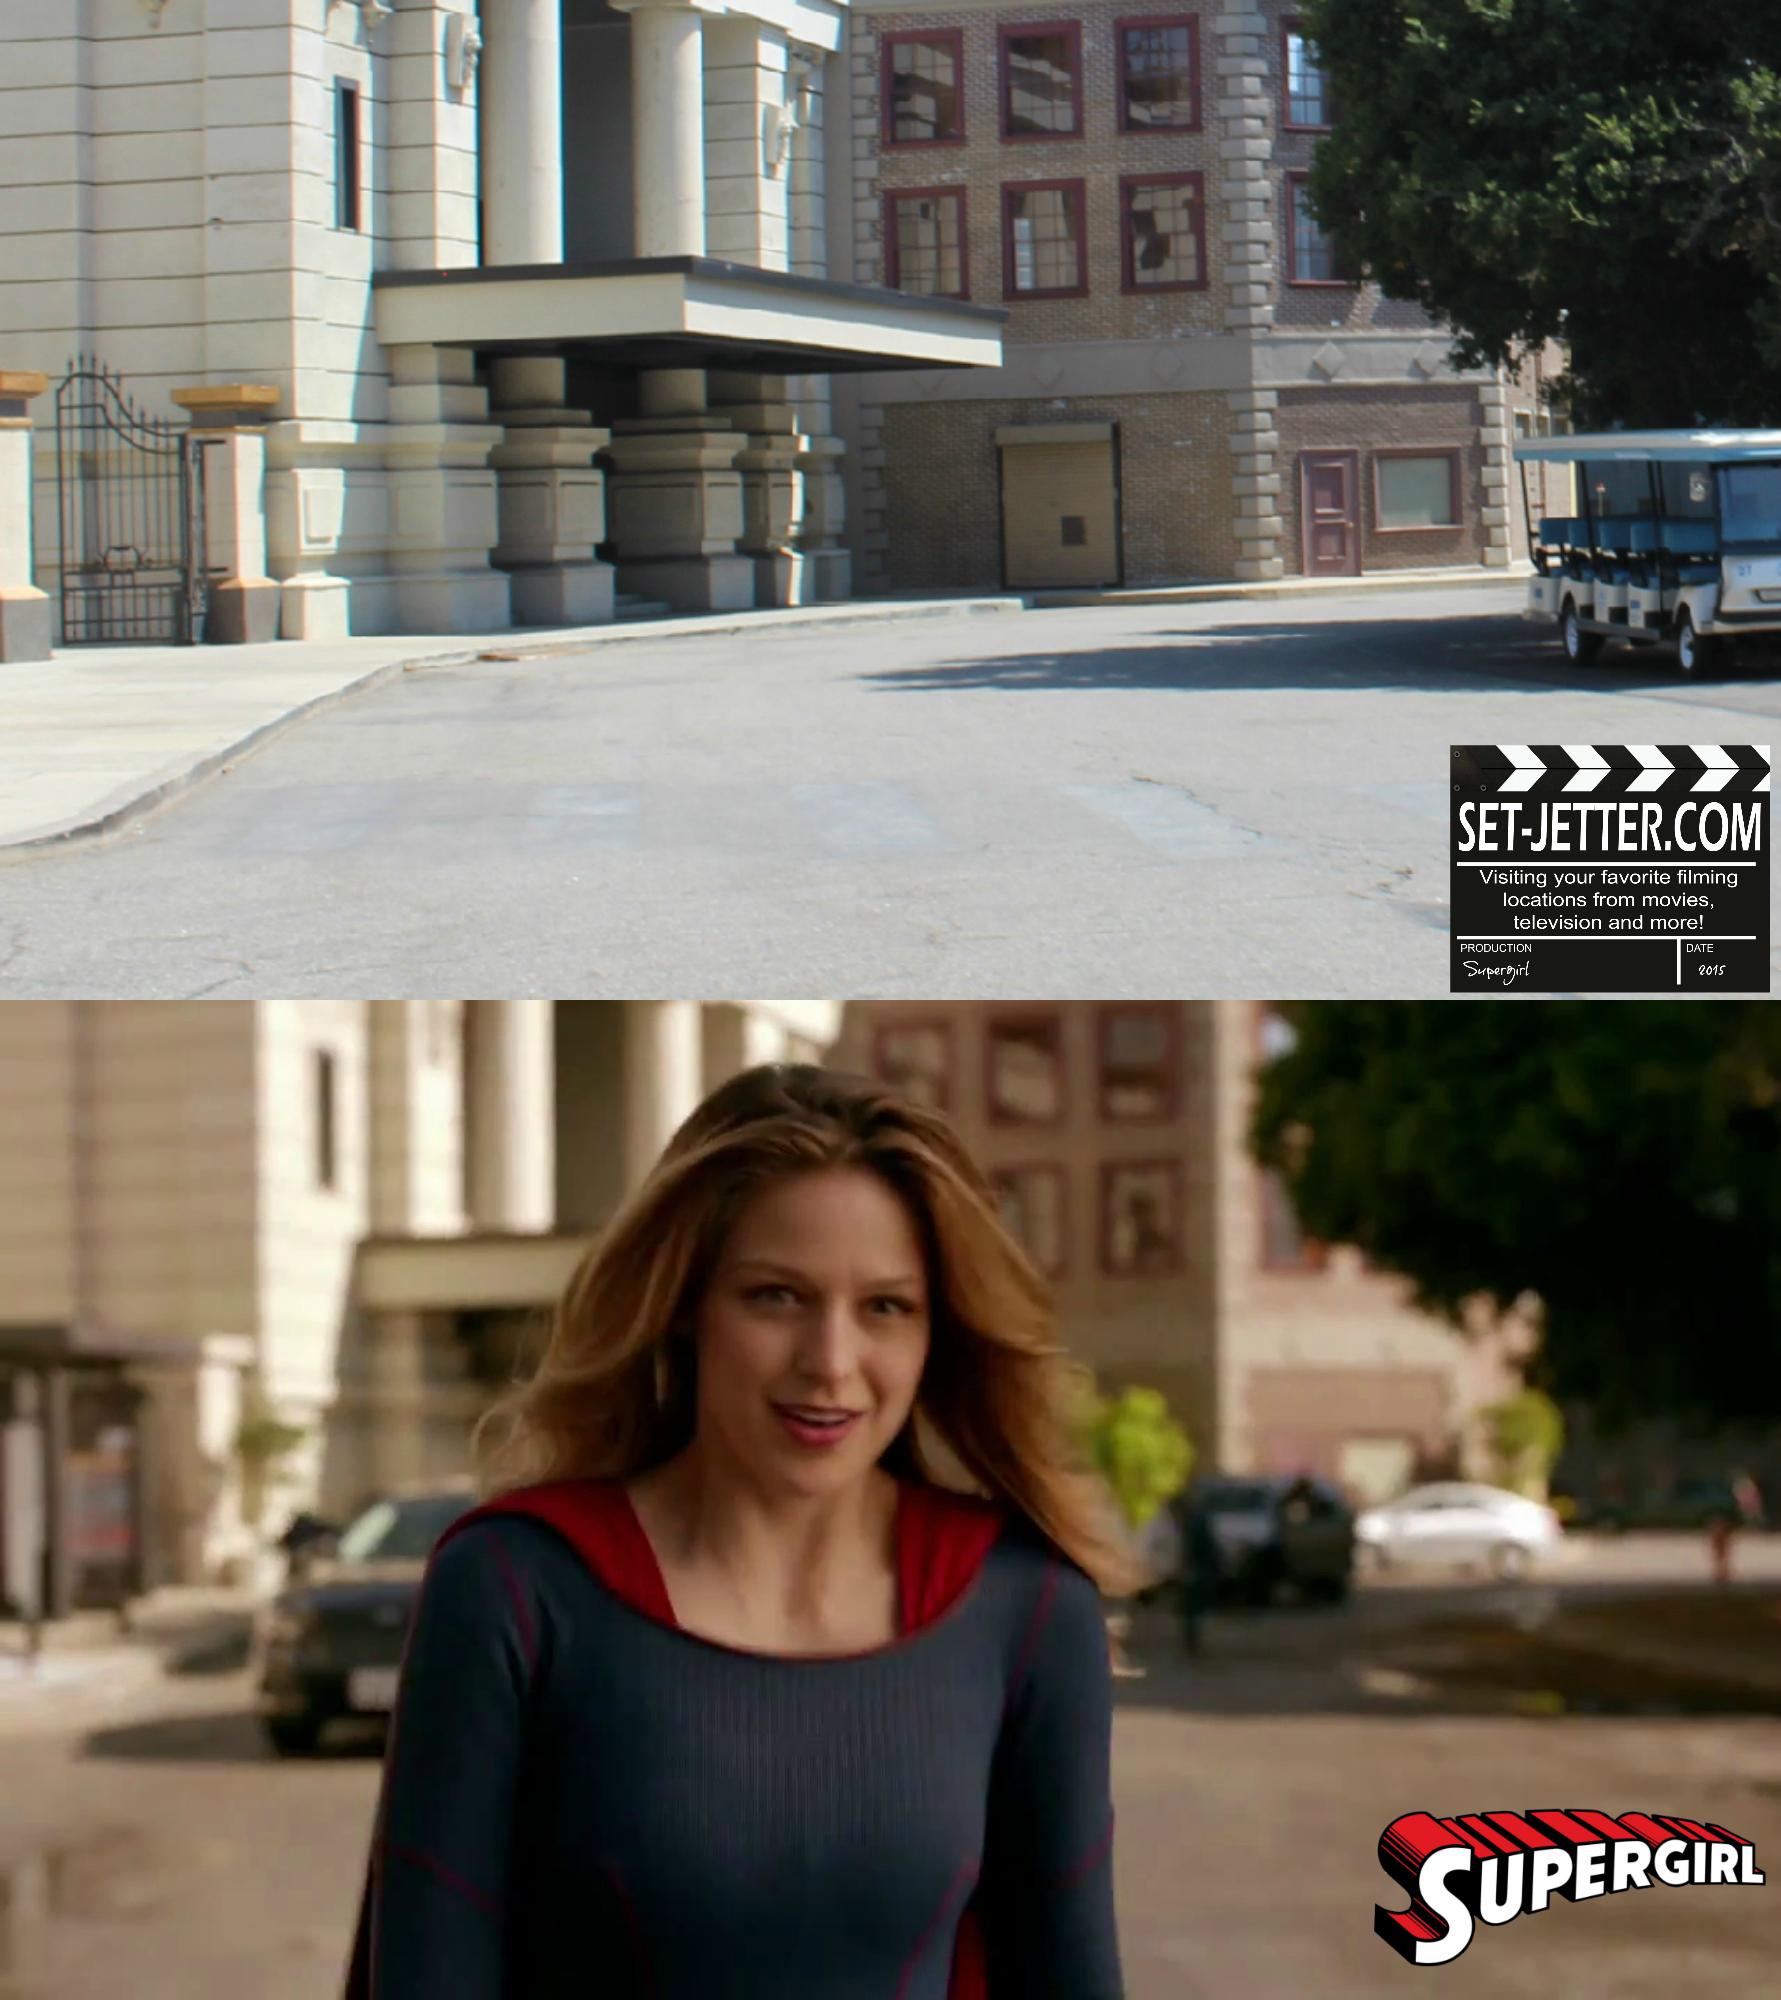 Supergirl comparison 27.jpg